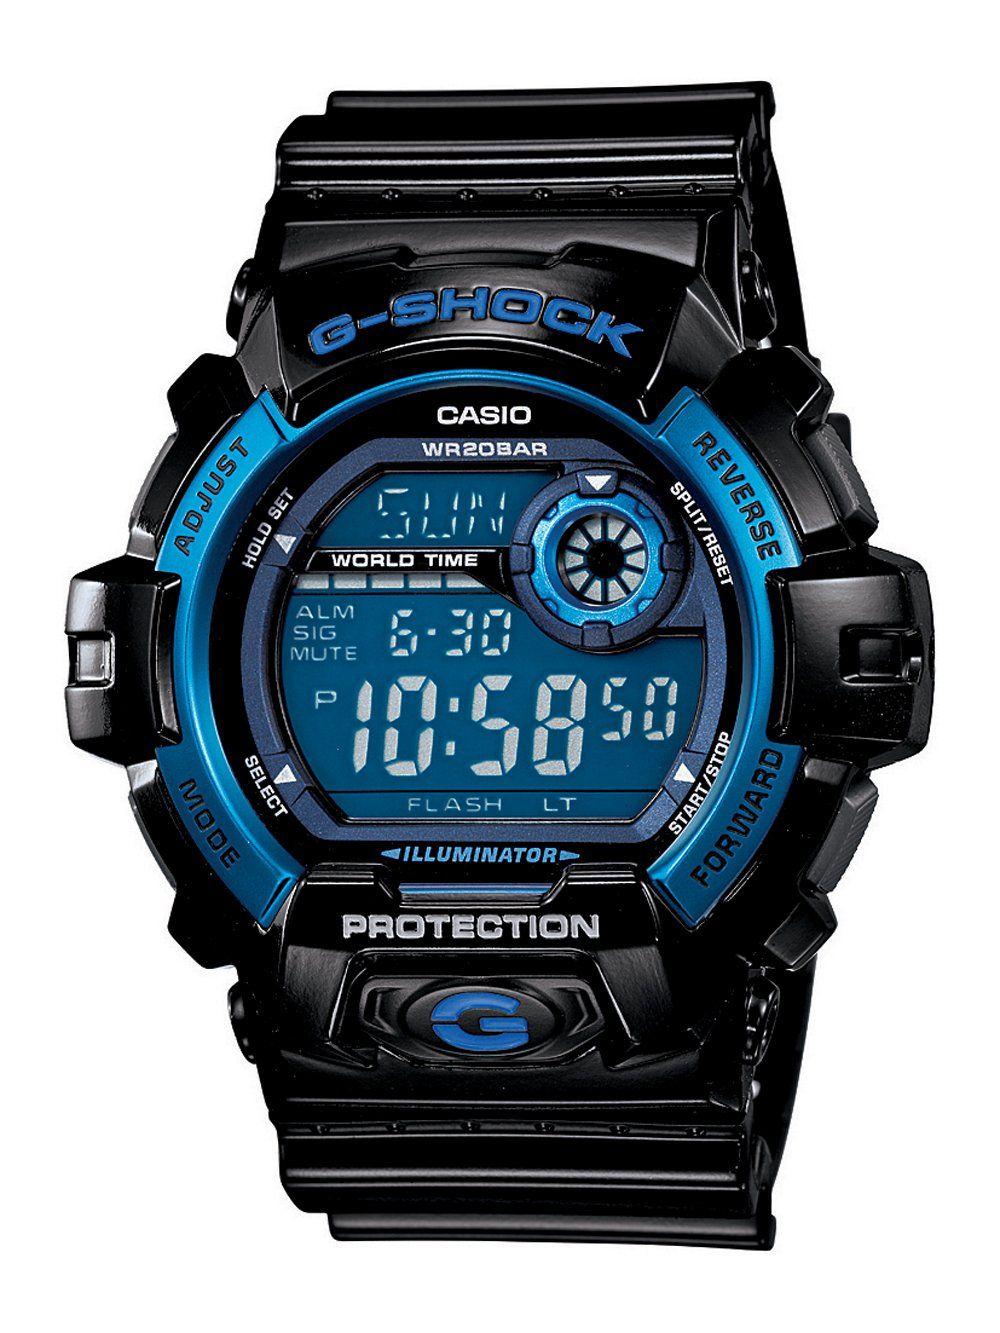 4b9d8fc3daa Casio Men s G8900A-1CR G-Shock Black and Blue Resin Digital Sport Watch